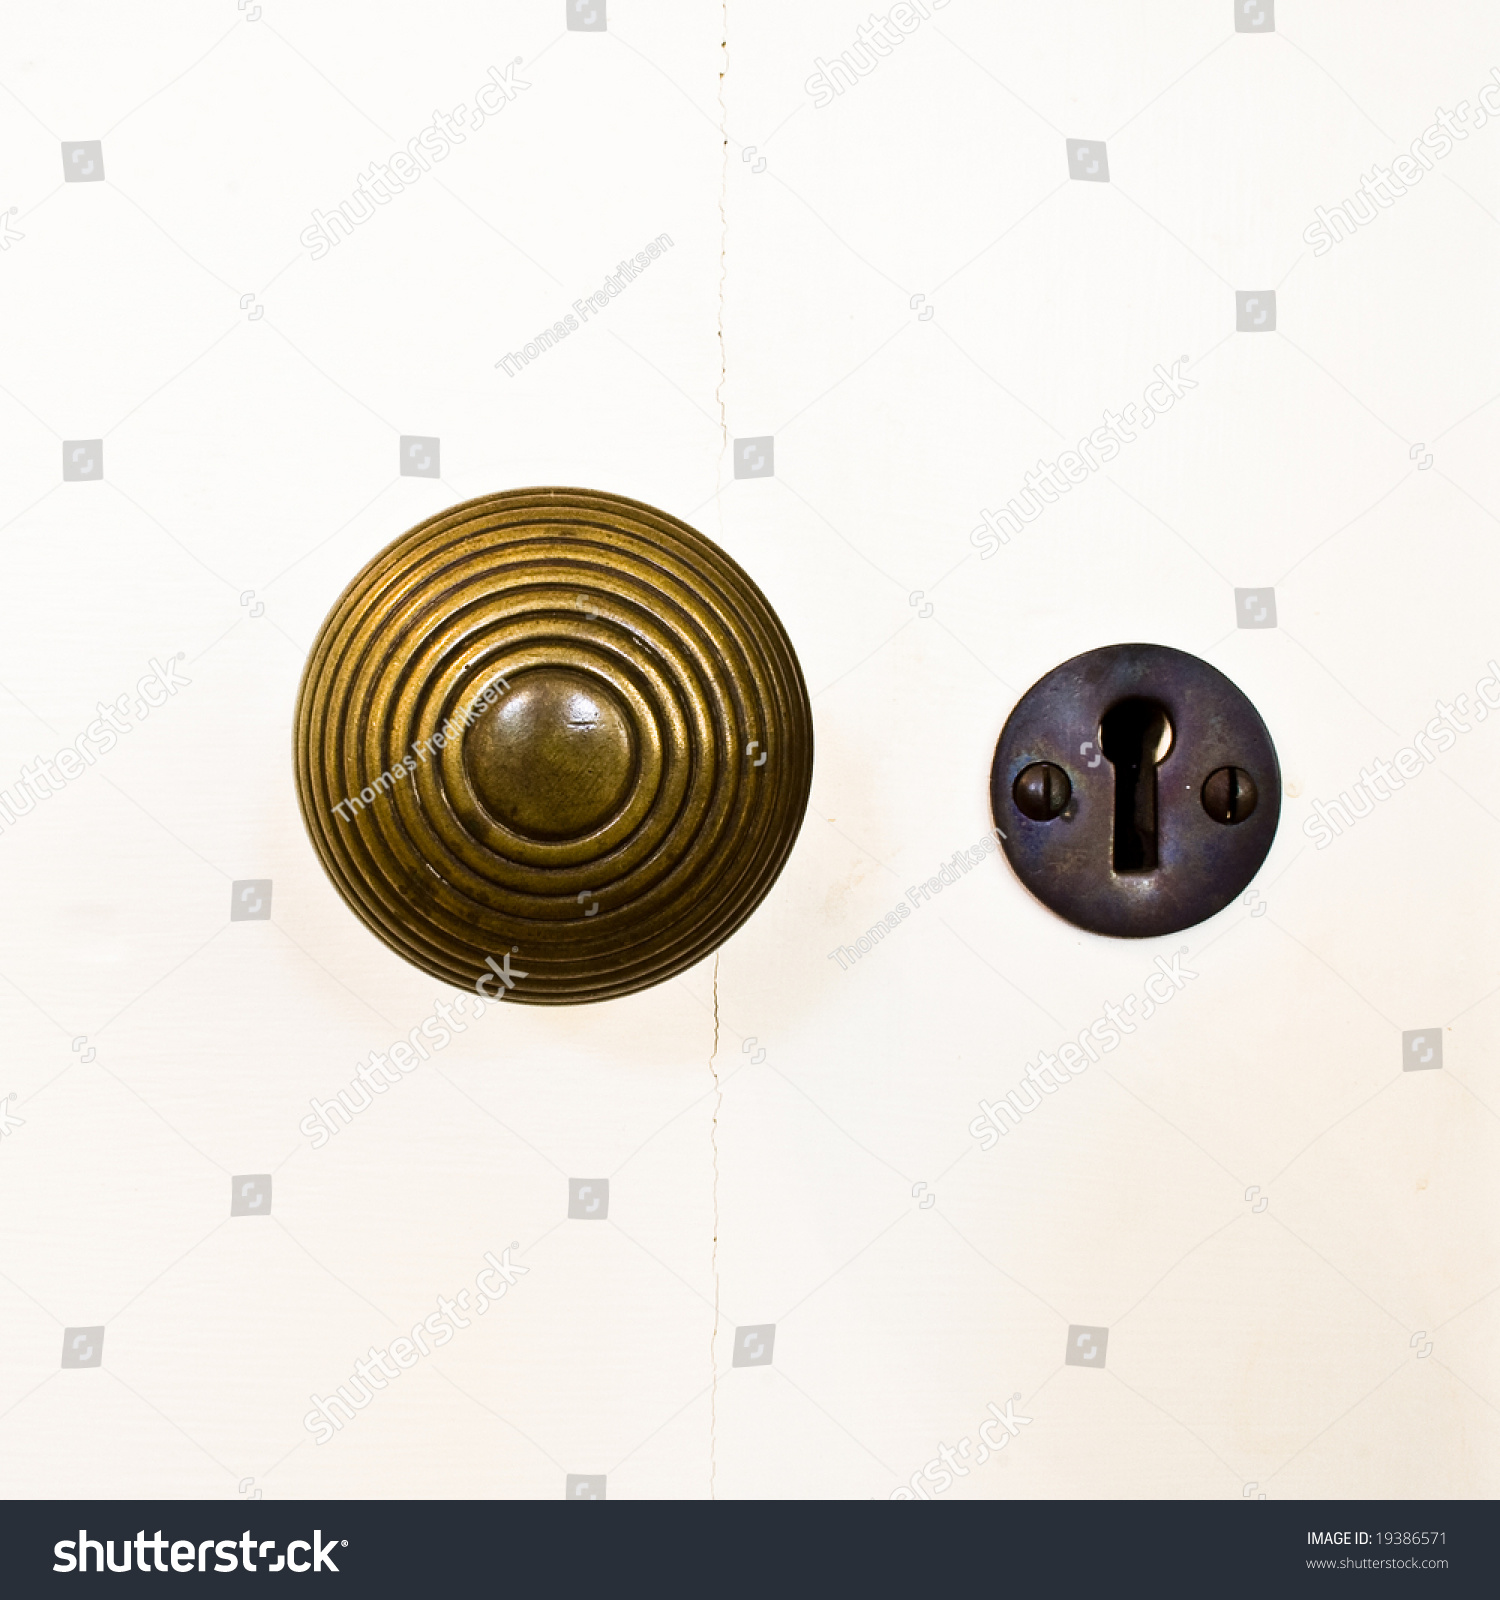 unlocking door knob with hole photo - 20